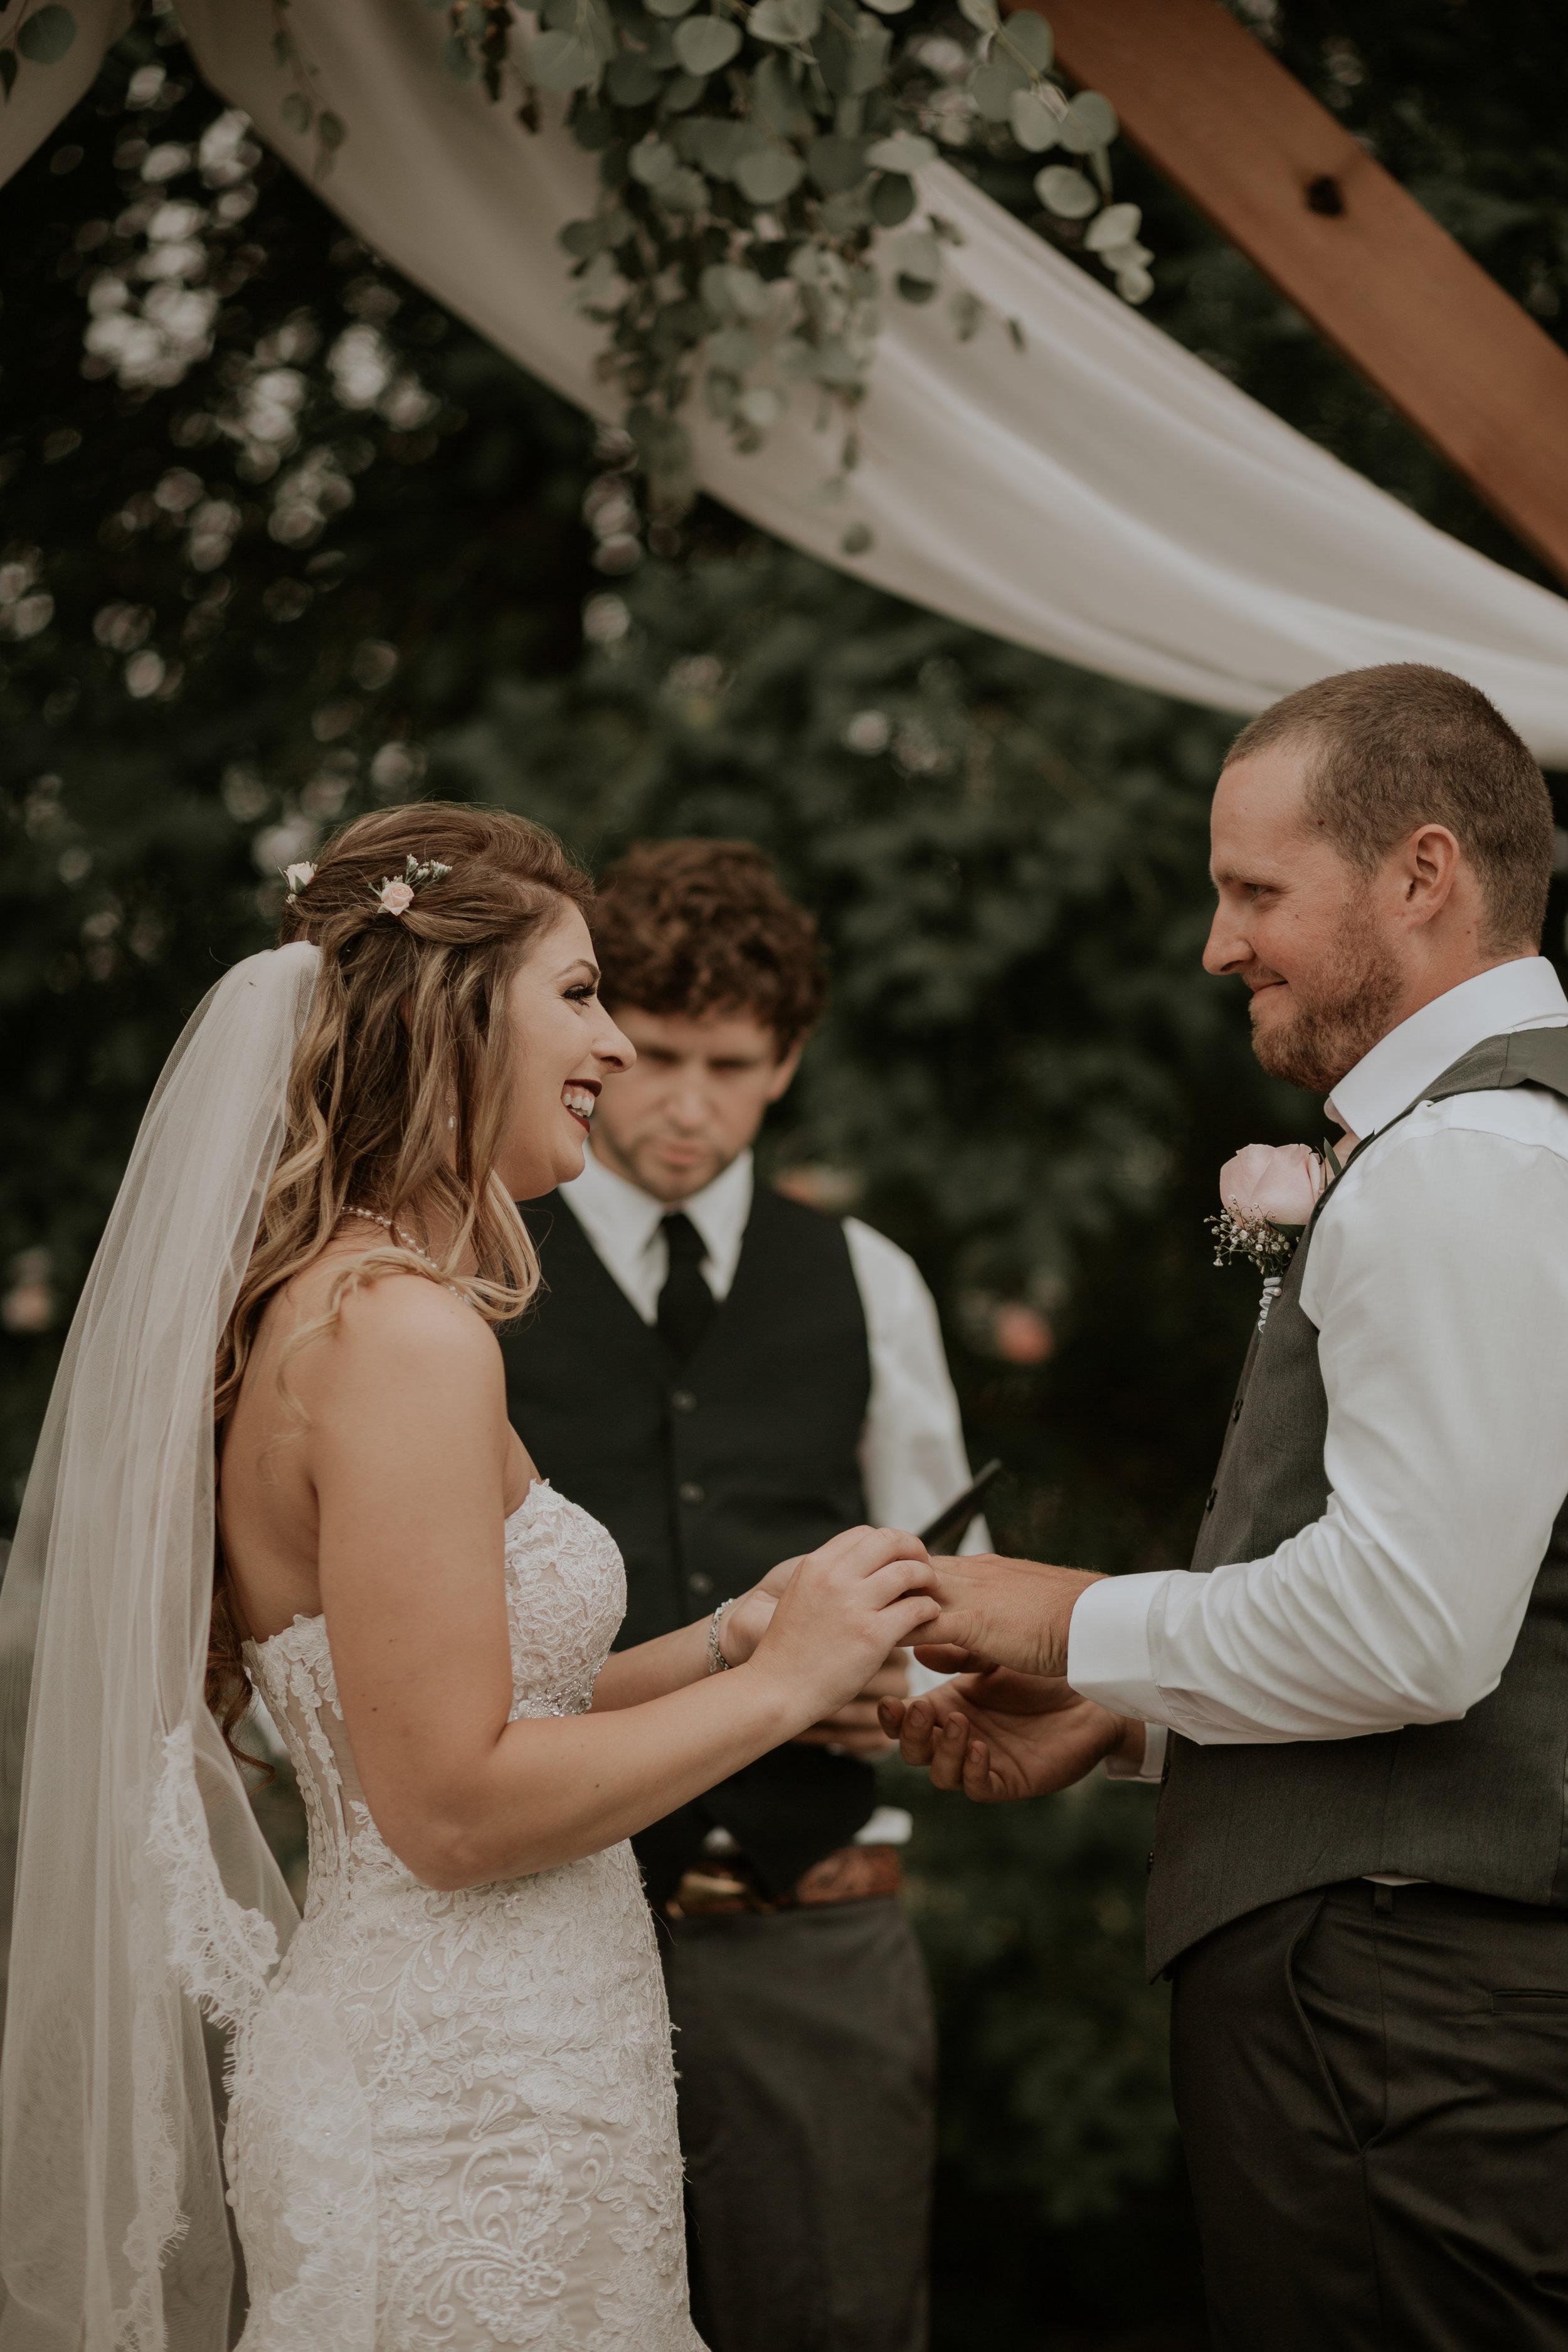 Olympic-Peninsula-Wedding-Photographer-PNW-Forks-Port-Angeles-Kayla-Dawn-Photography-engagement-Olympic-National-Park-51.jpg